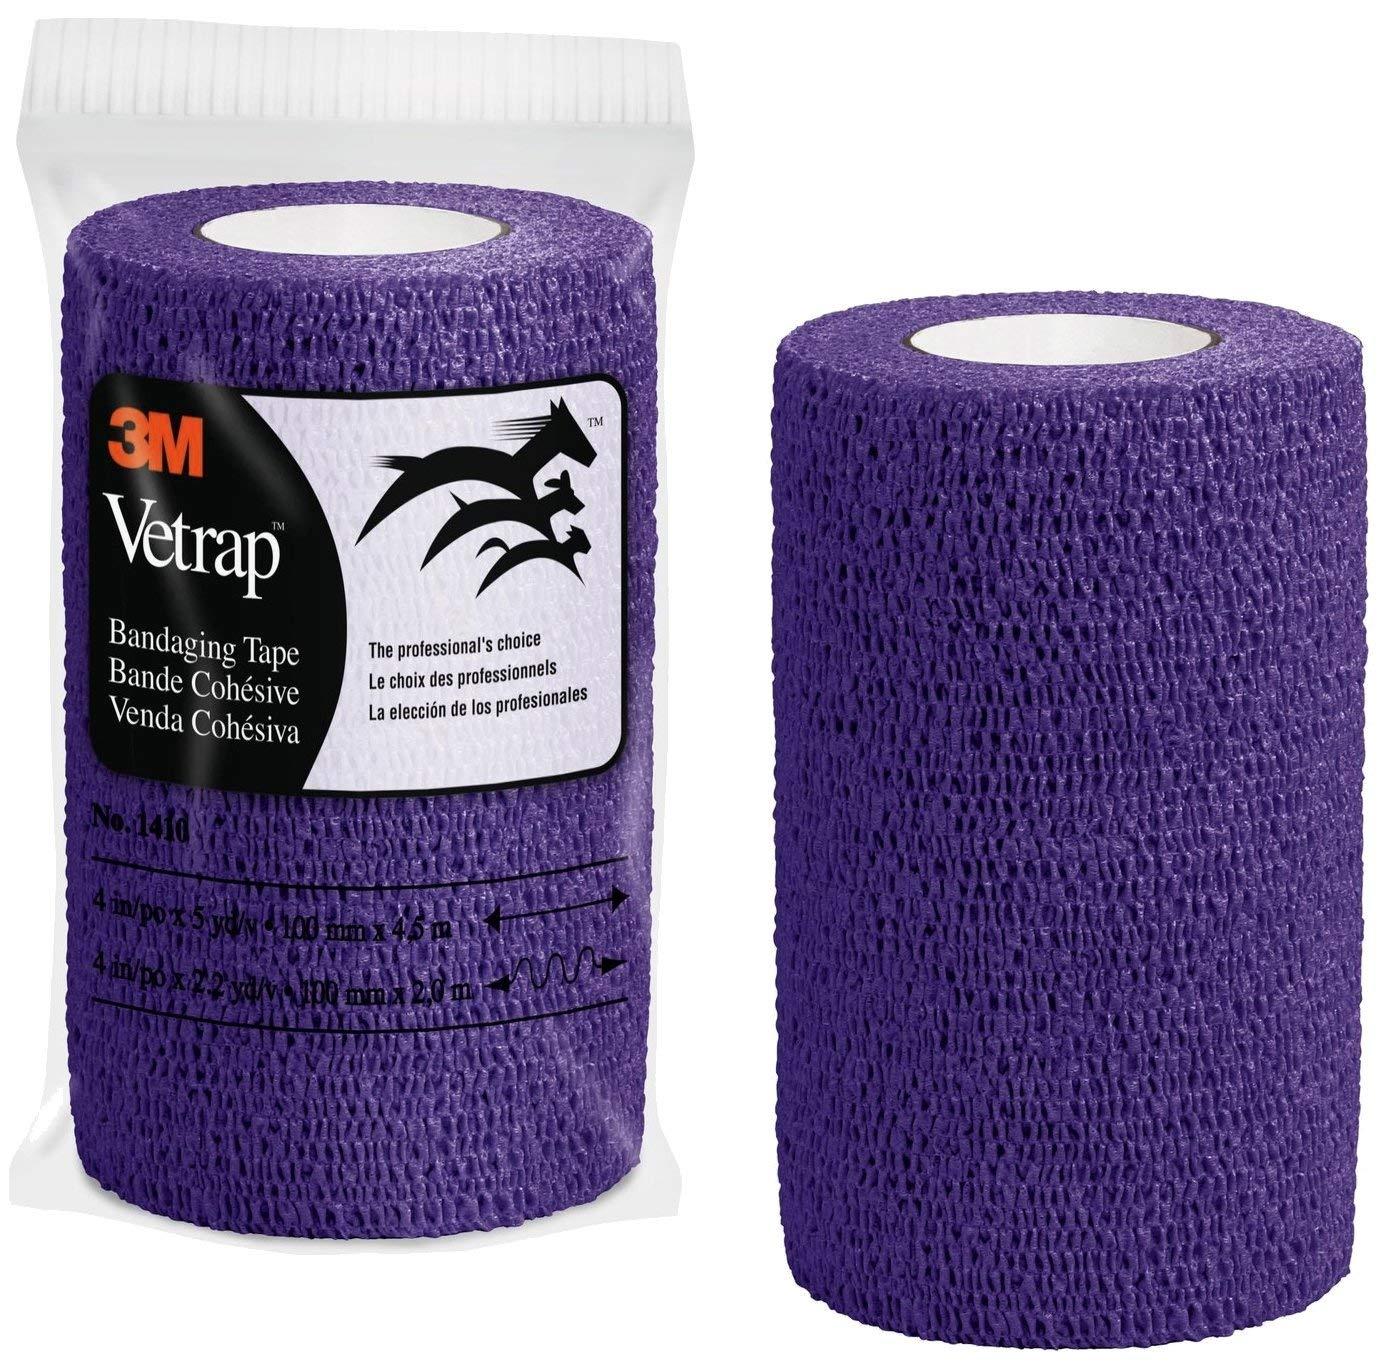 3M Vetrap 4'' Bright Color Bandaging Tape, 4''x 5 Yards, 3M Box, 12 Roll Case (Purple) by 3M Vetrap